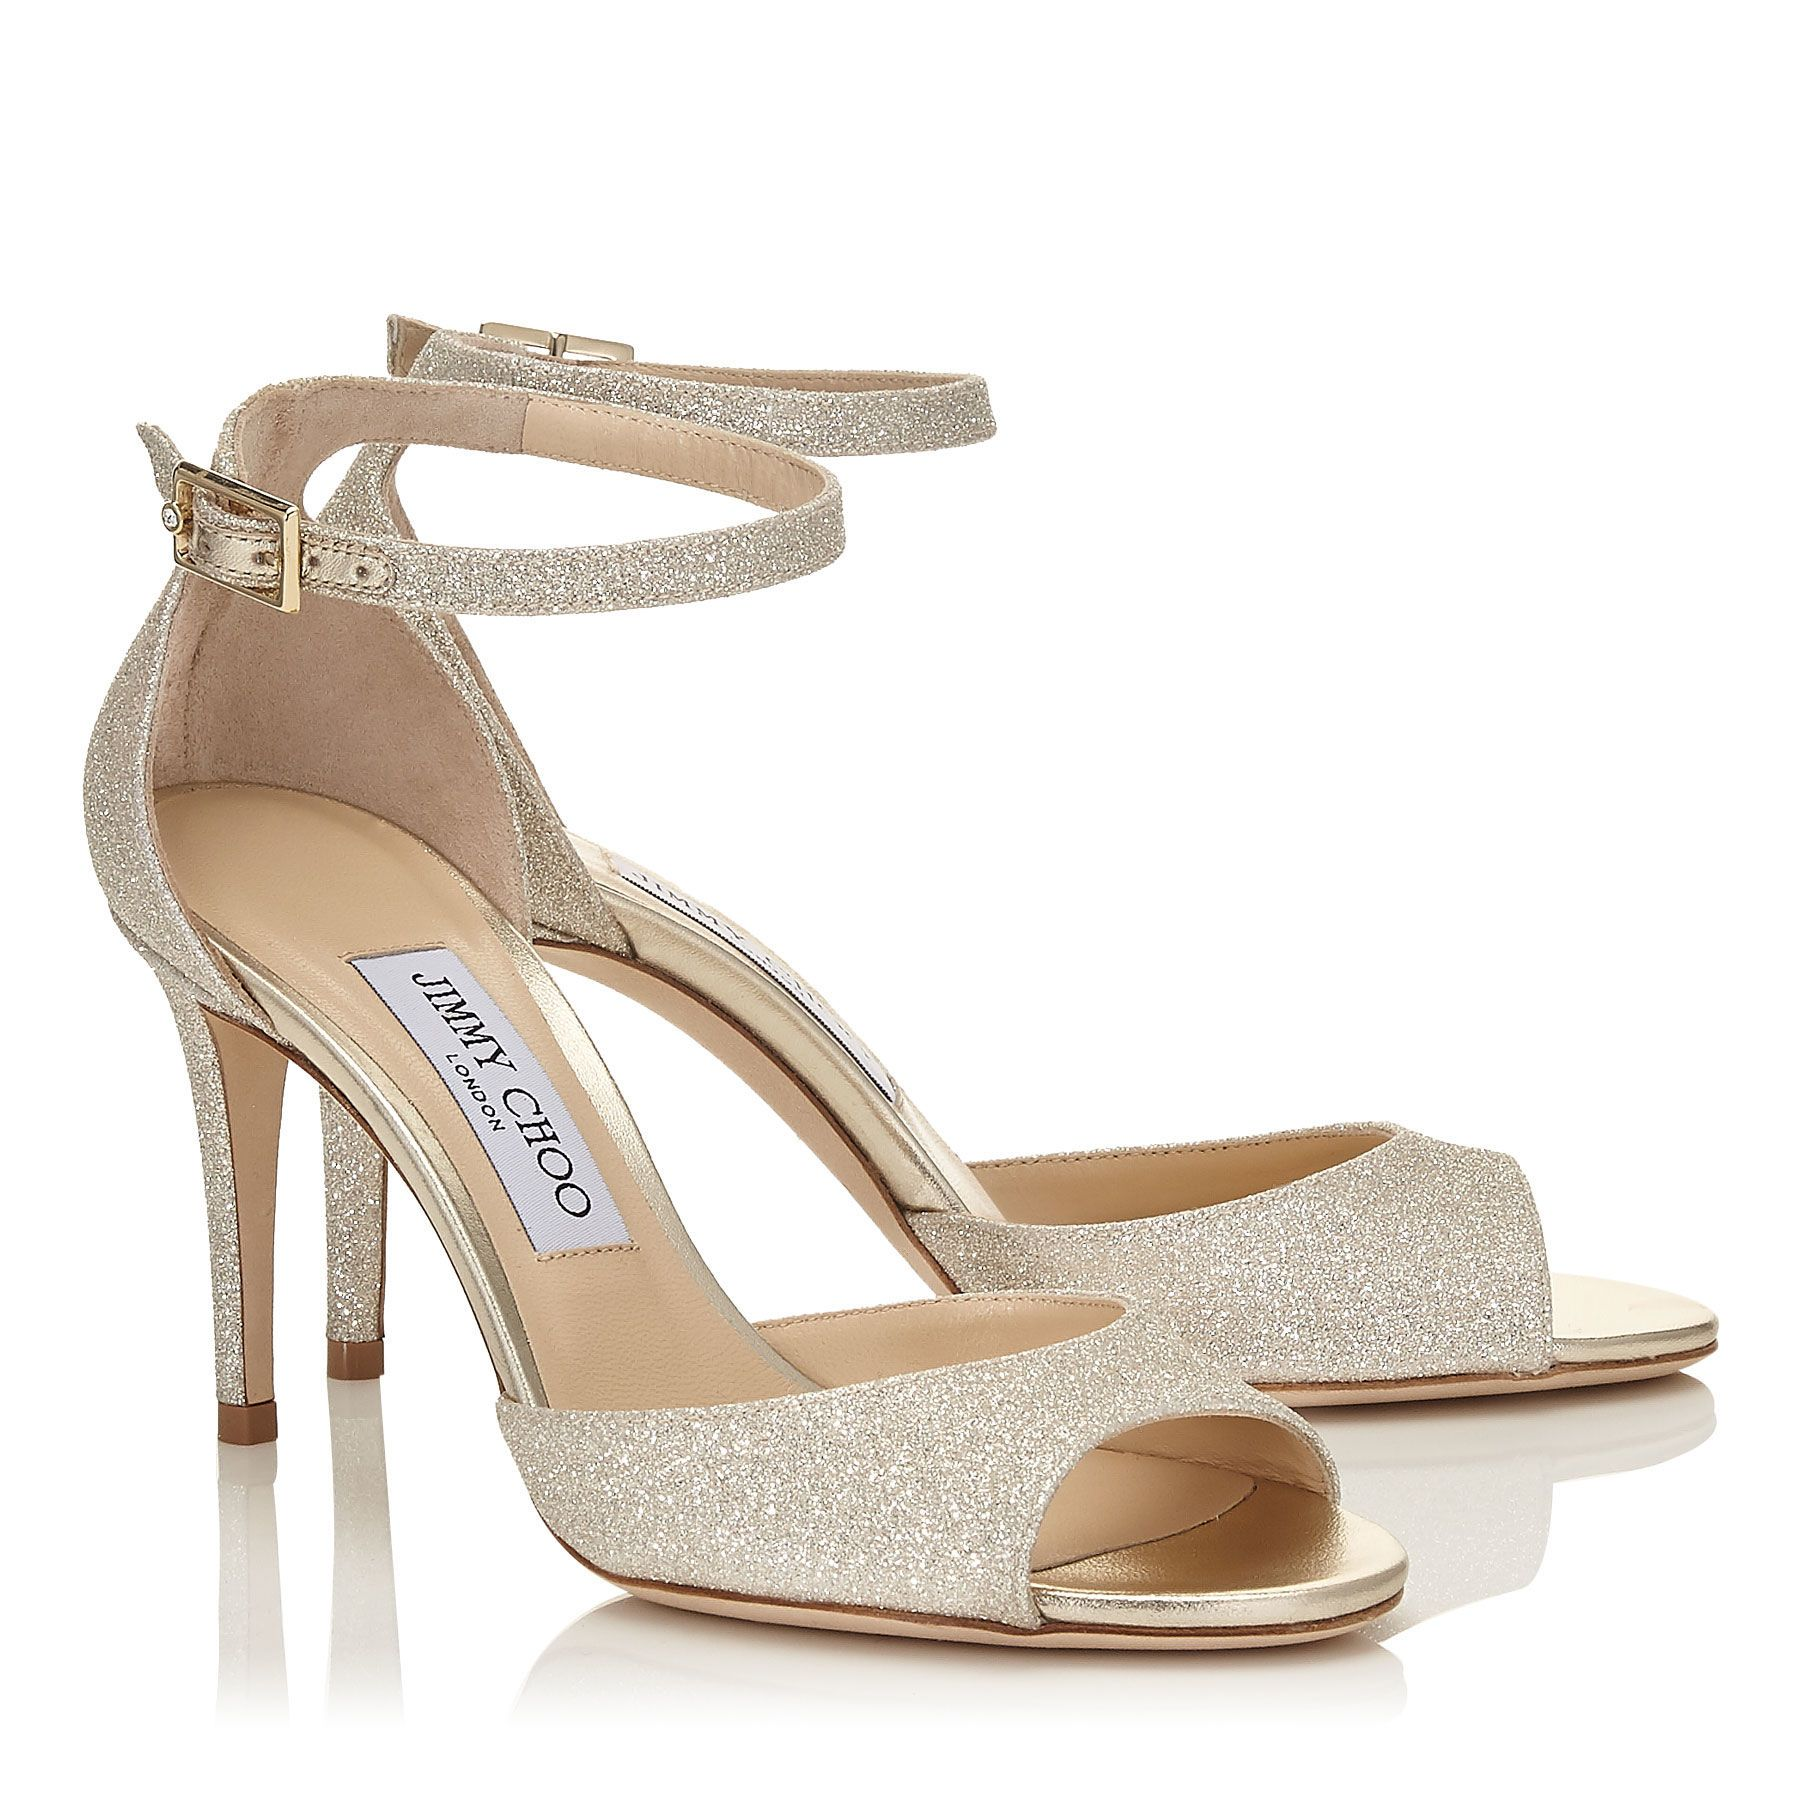 7a56cce439b Platinum Ice Dusty Glitter Peep Toe Sandals